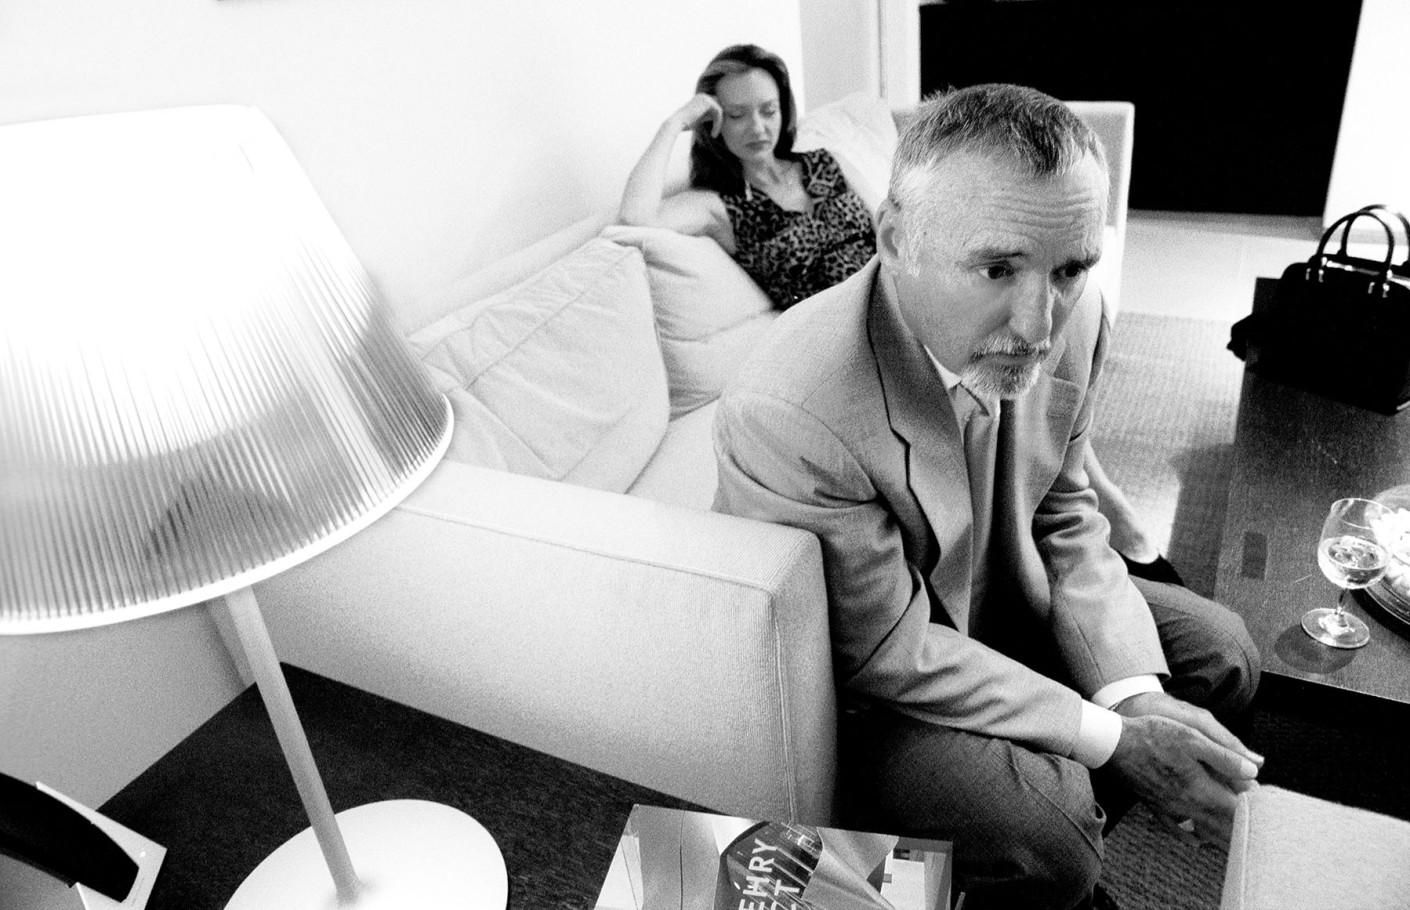 Dennis Hopper | Photo by Elizabeth Lippman